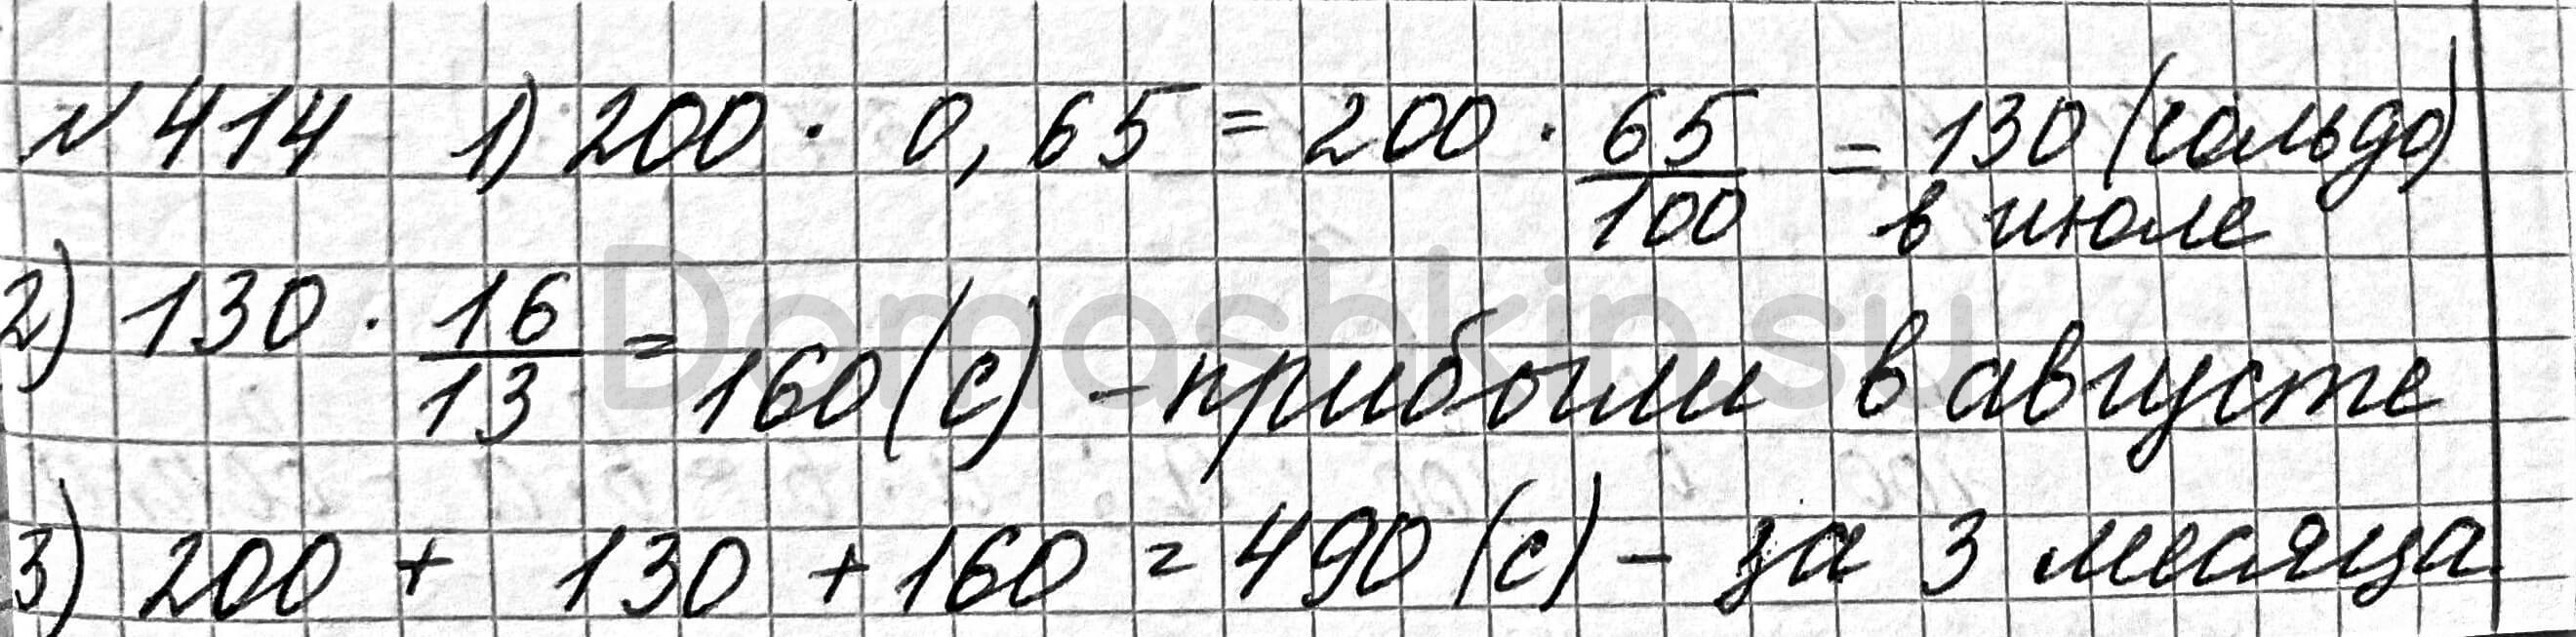 Математика 6 класс учебник Мерзляк номер 414 решение